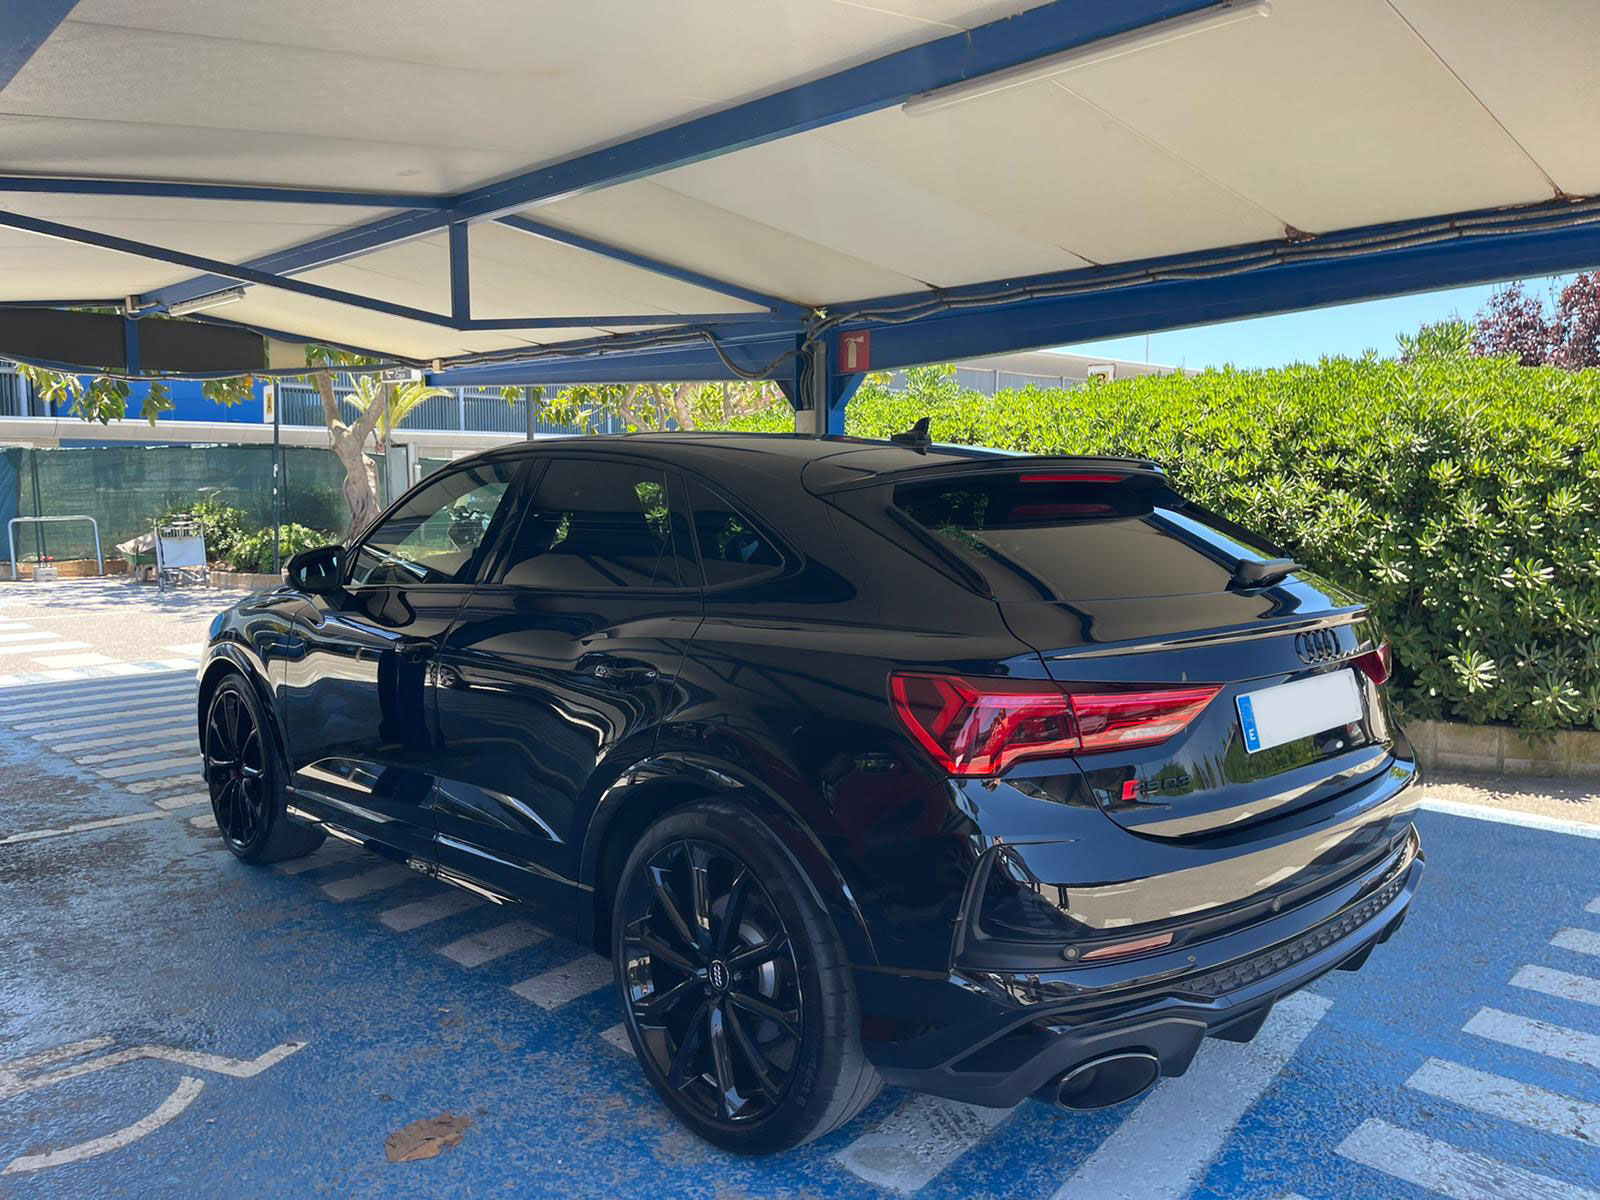 Audi-RSQ3-Rental-Ibiza-3